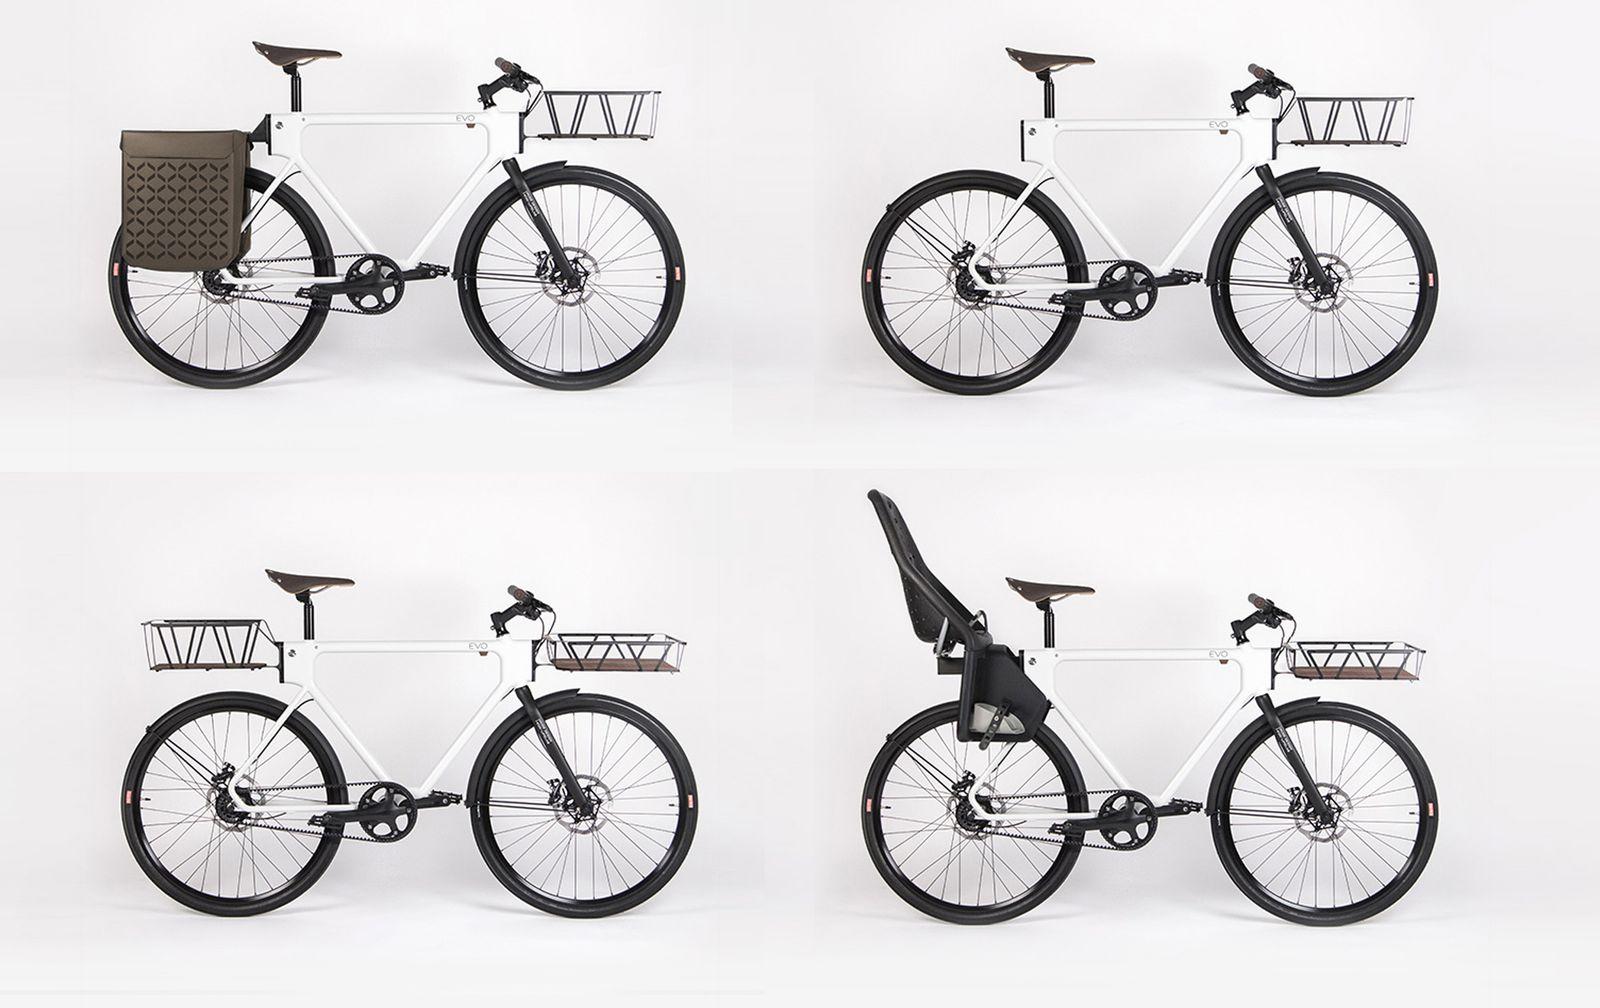 Evo San Francisco: Huge Design x 4130 Cycle Works